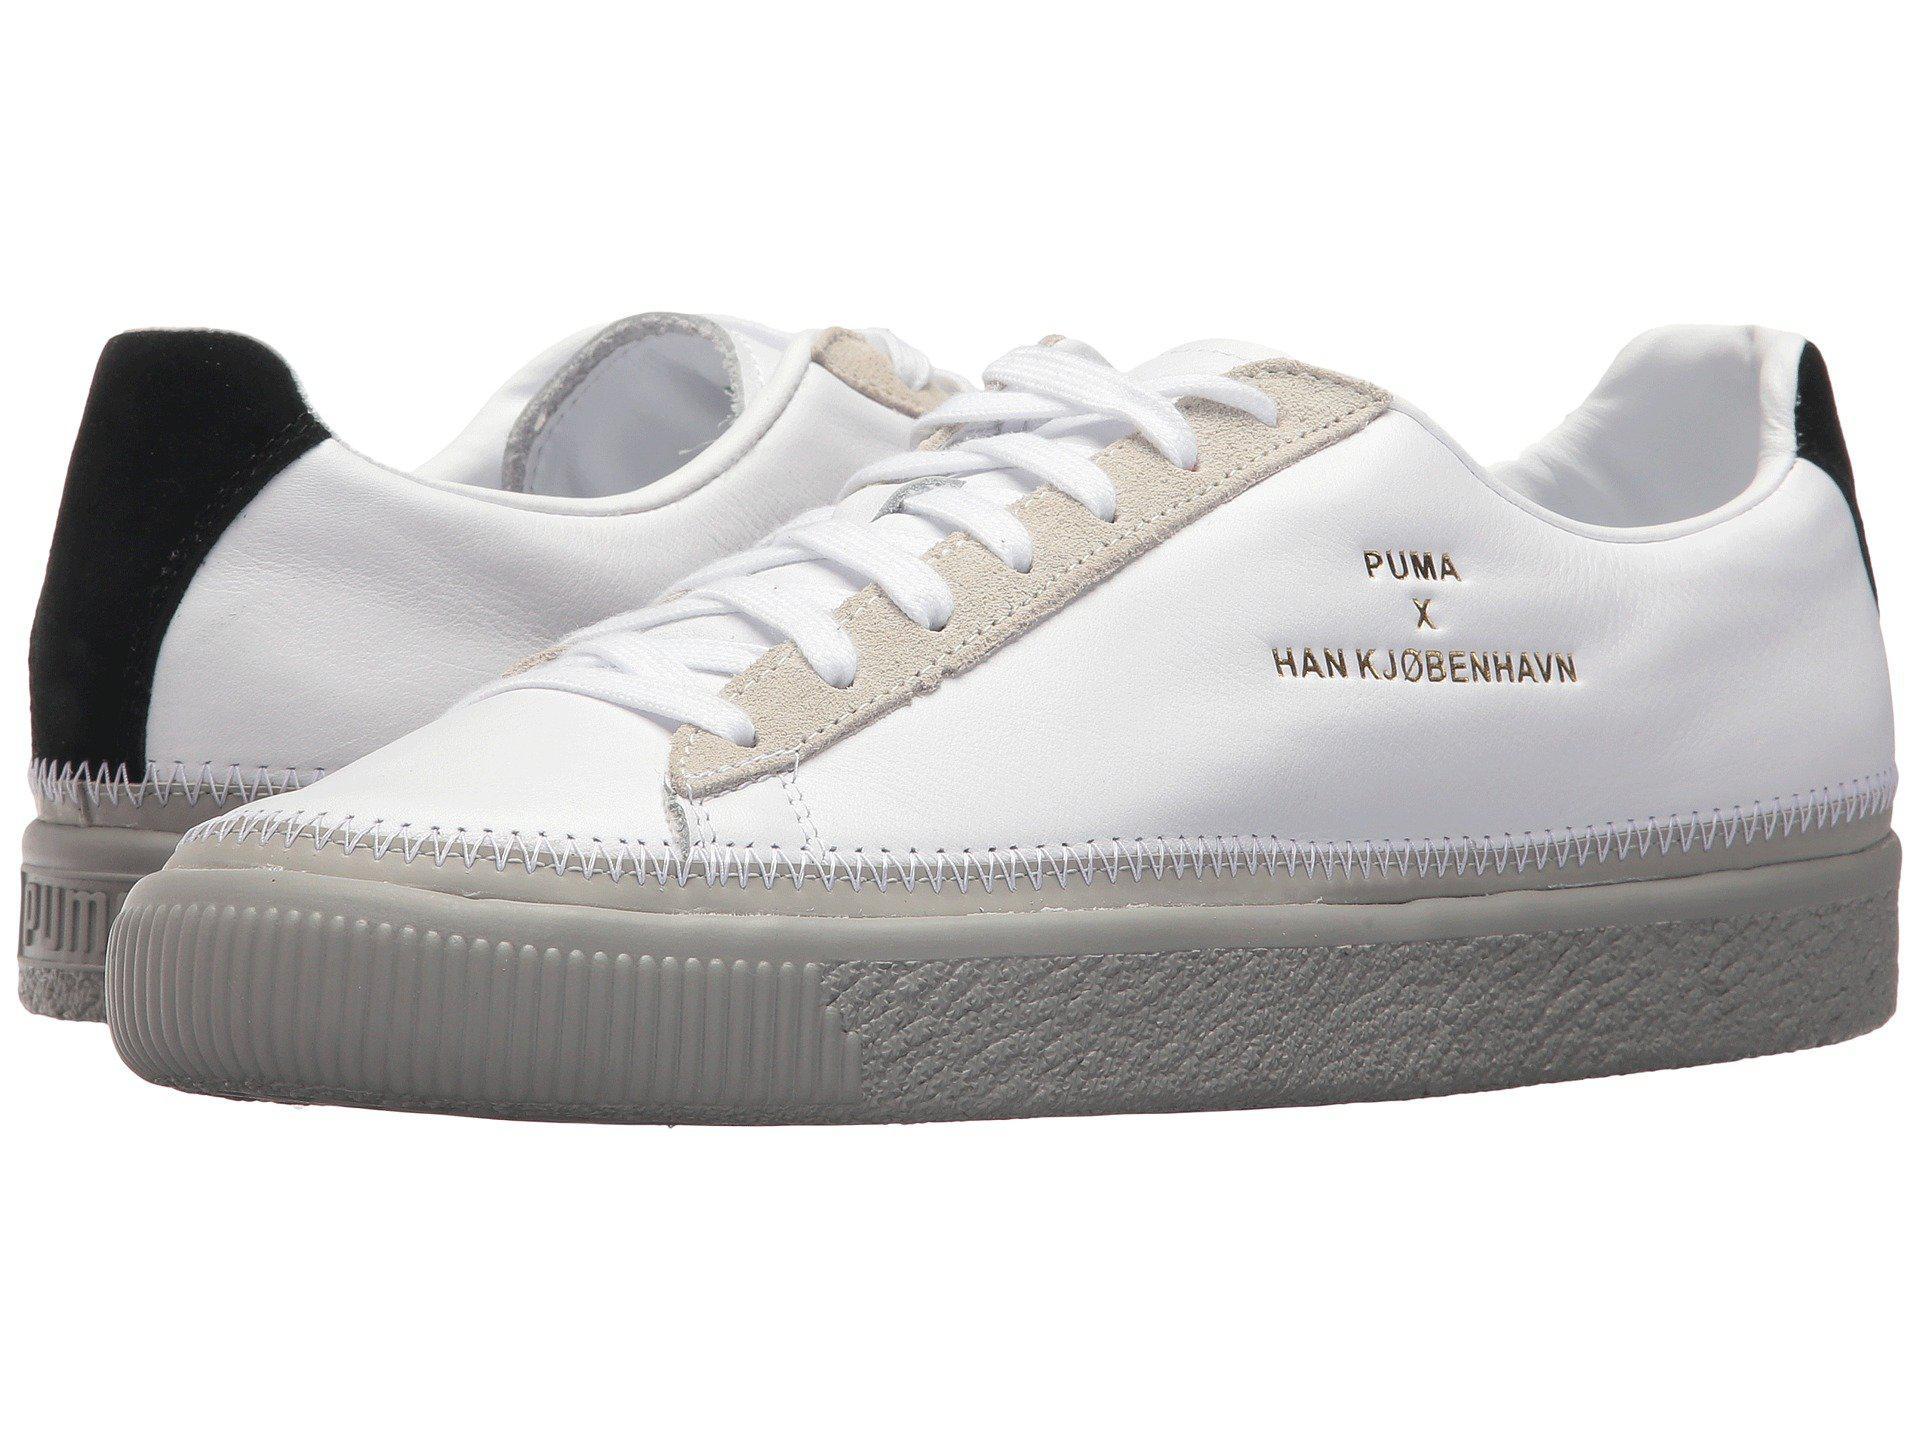 a6cbc4441e8674 Lyst - PUMA X Han Kjobenhavn Basket Stitched Sneaker for Men